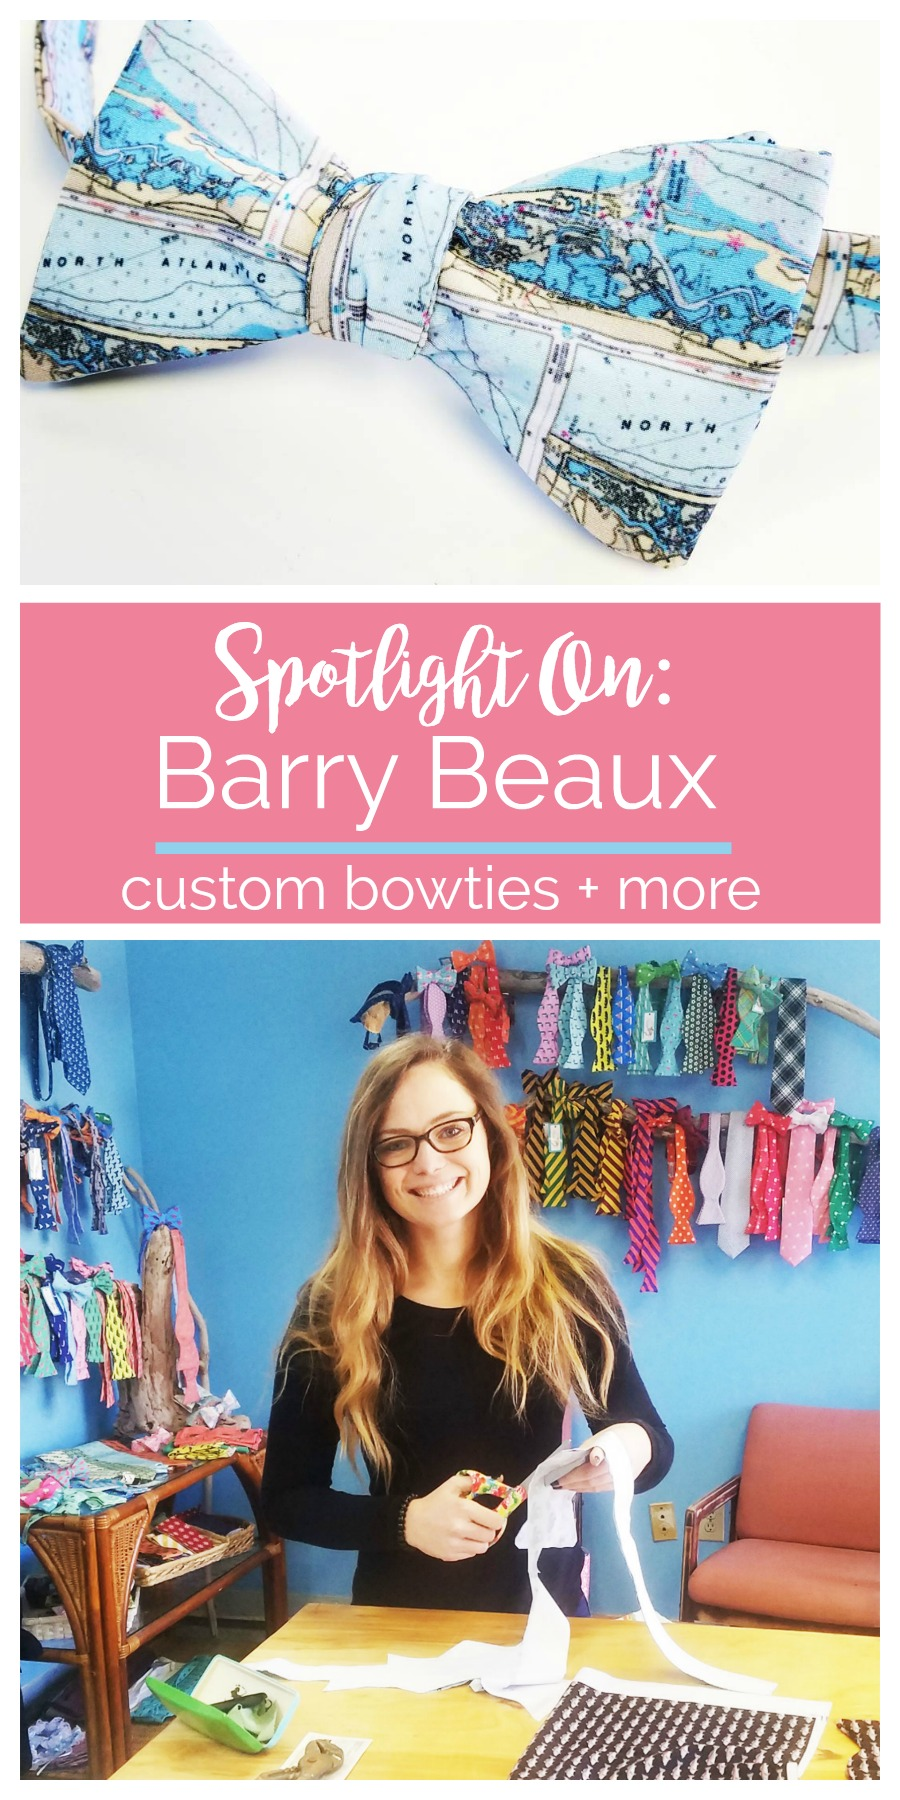 Spotlight On: Barry Beaux | Palmetto State Weddings